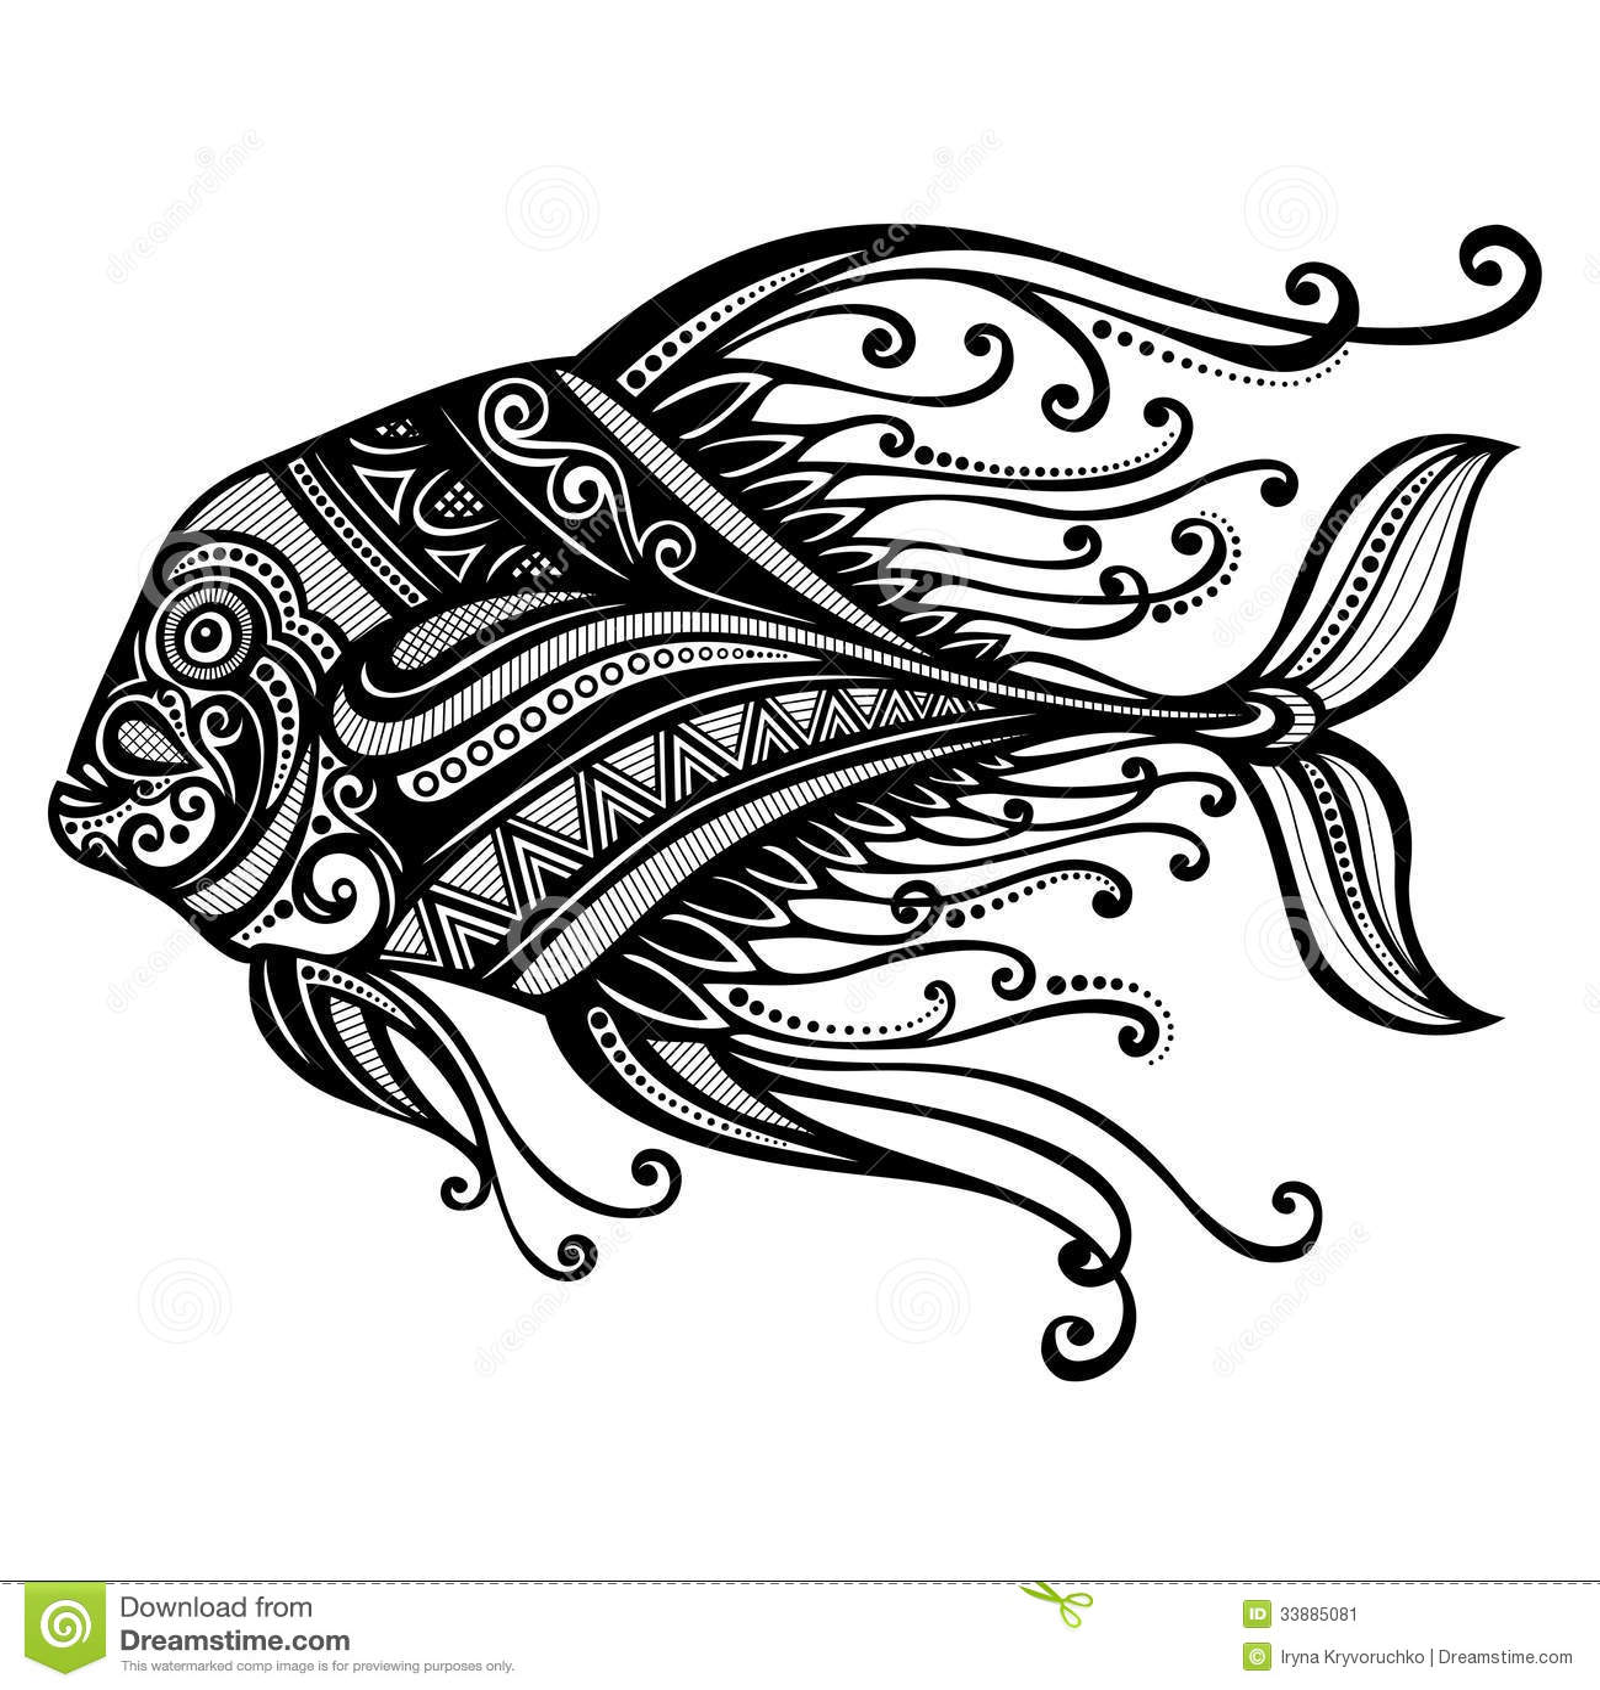 Abstract fish designs - photo#2